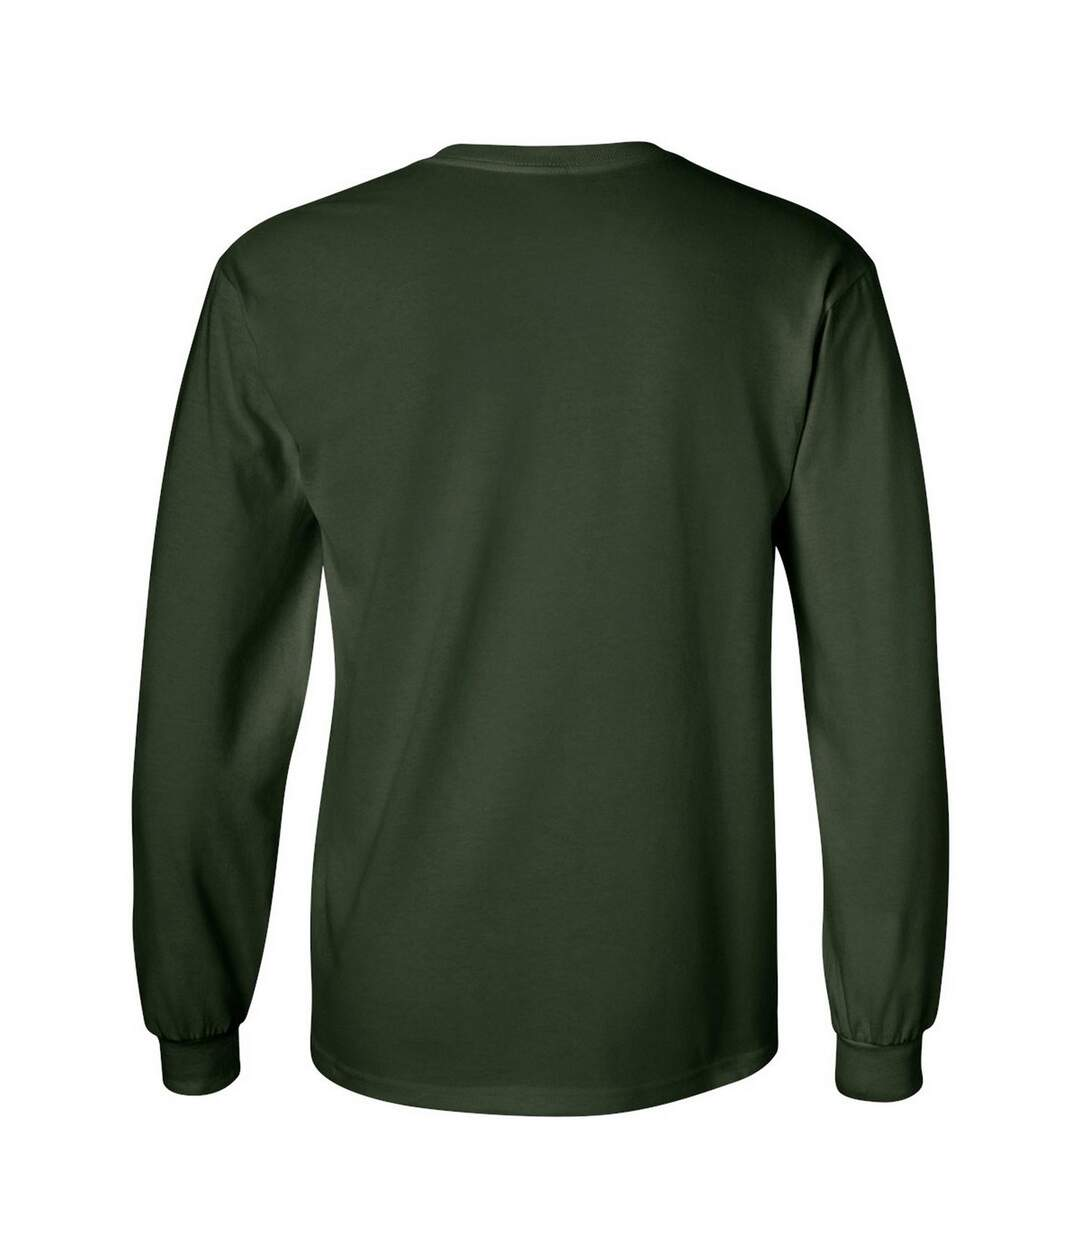 Gildan Mens Plain Crew Neck Ultra Cotton Long Sleeve T-Shirt (Light Blue) - UTBC477